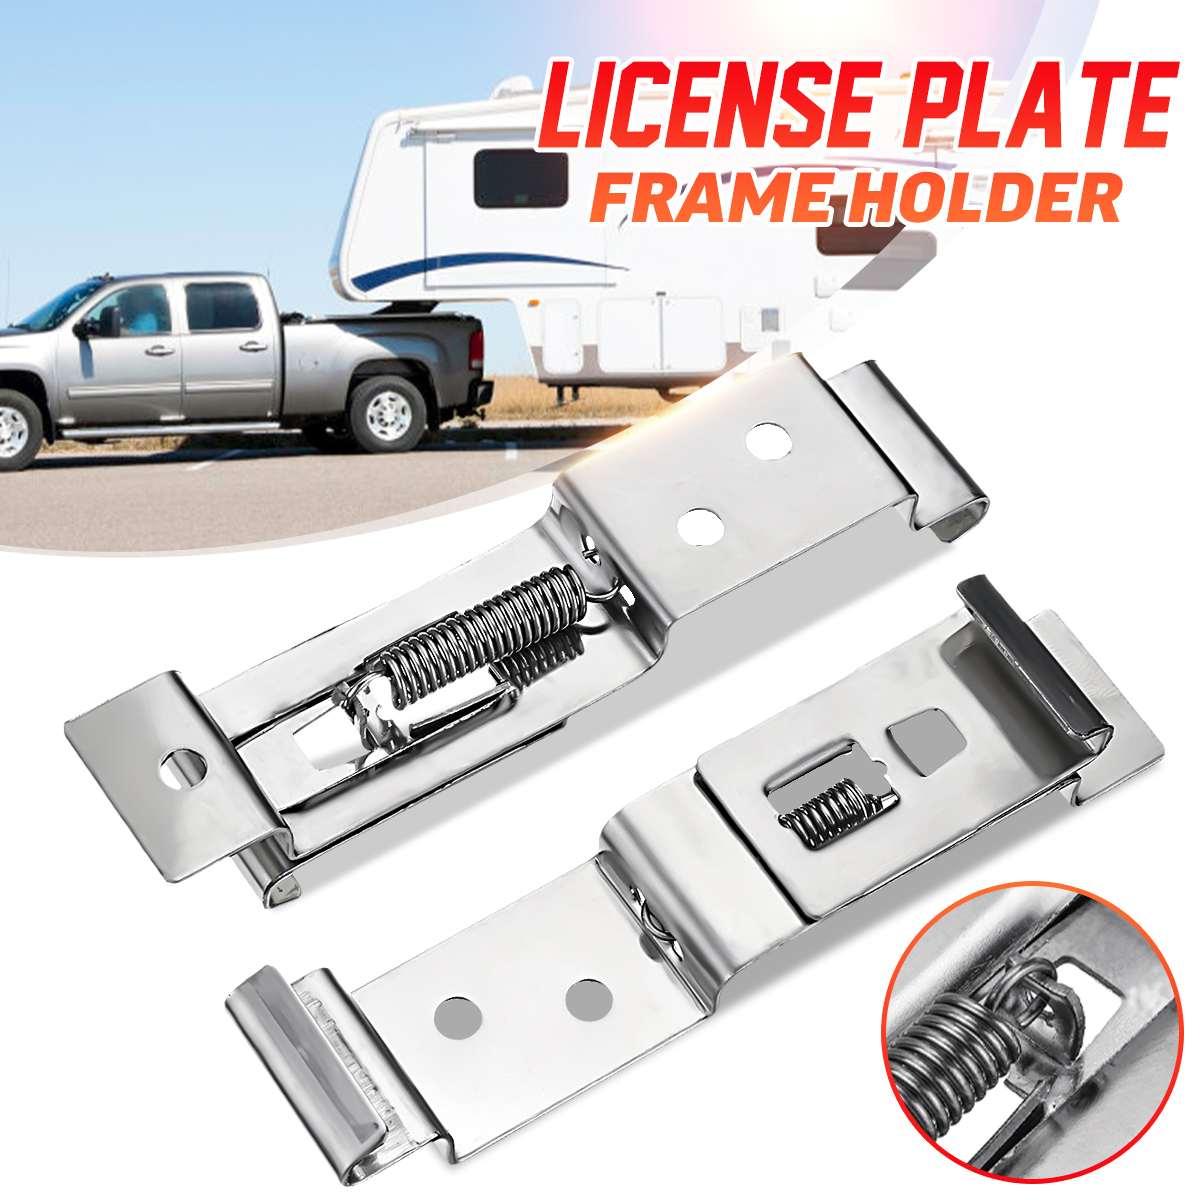 2Pcs European EU Stainless Steel Car Number License Plate Frame Holder Bracket Rack For Camper Trailer Truck Clips Cover Spring